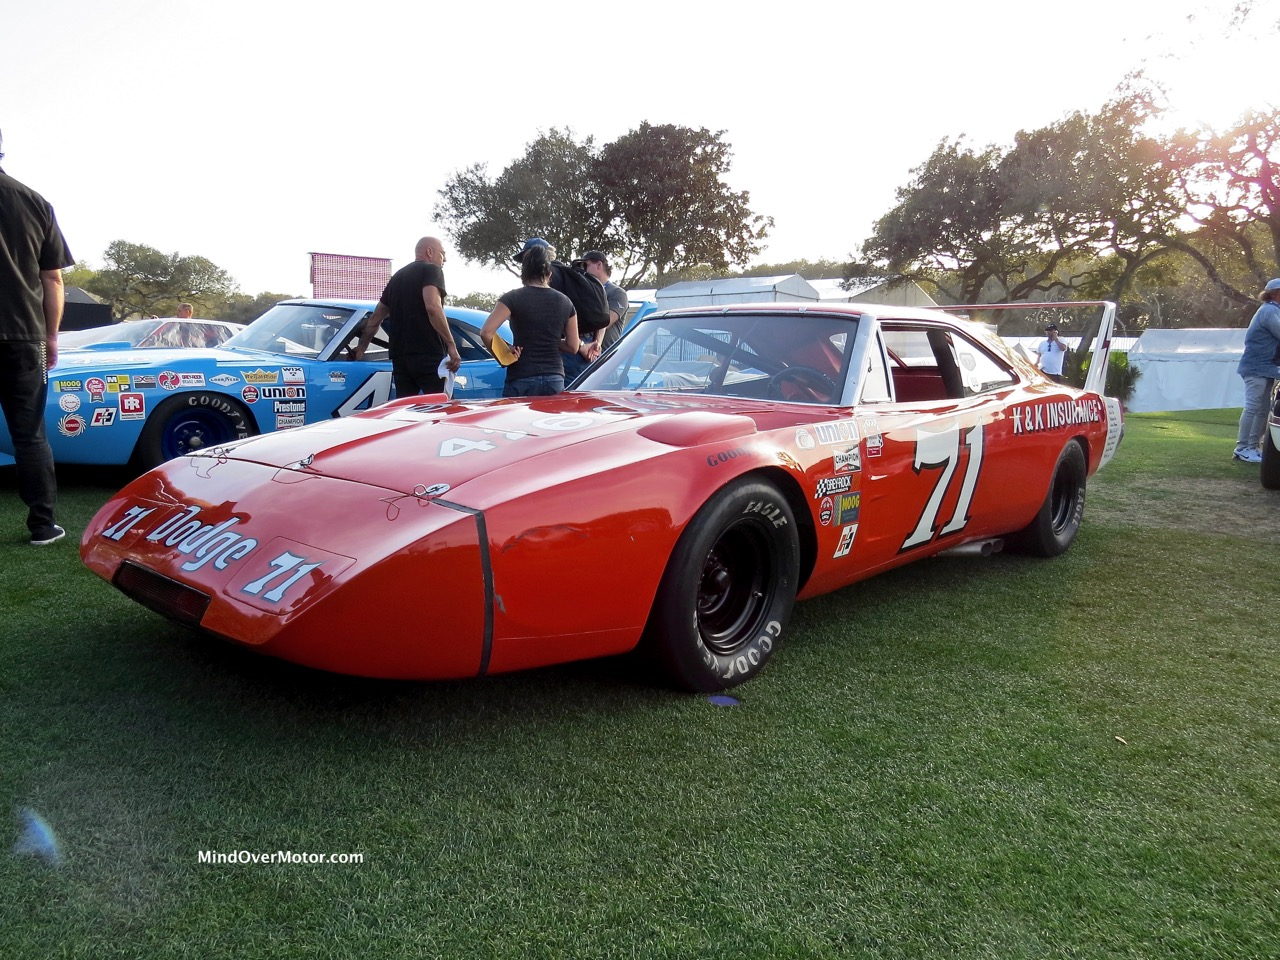 1969 Charger Daytona Front